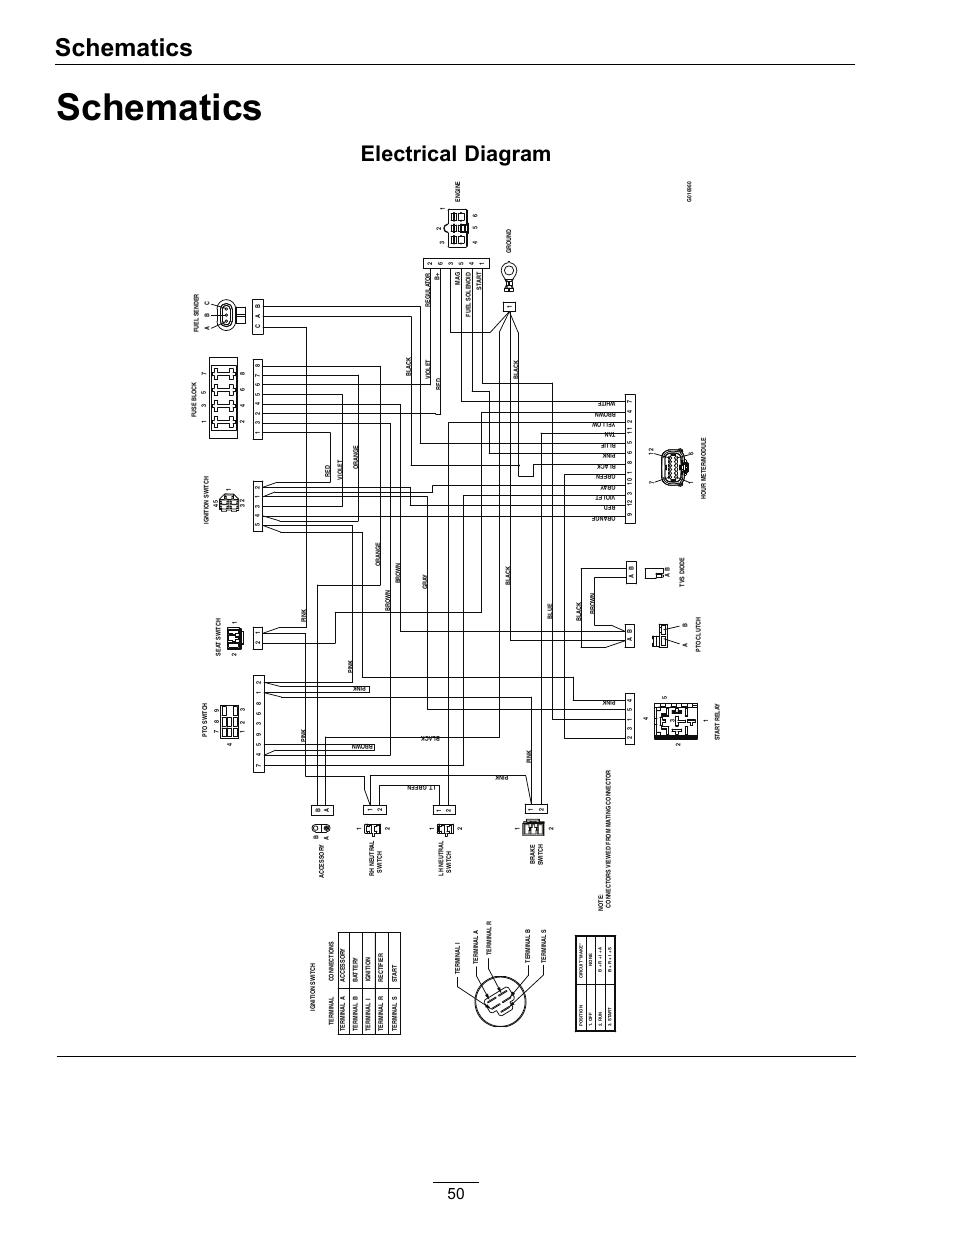 1981 Camaro Courtesy Lighting Wiring Diagram